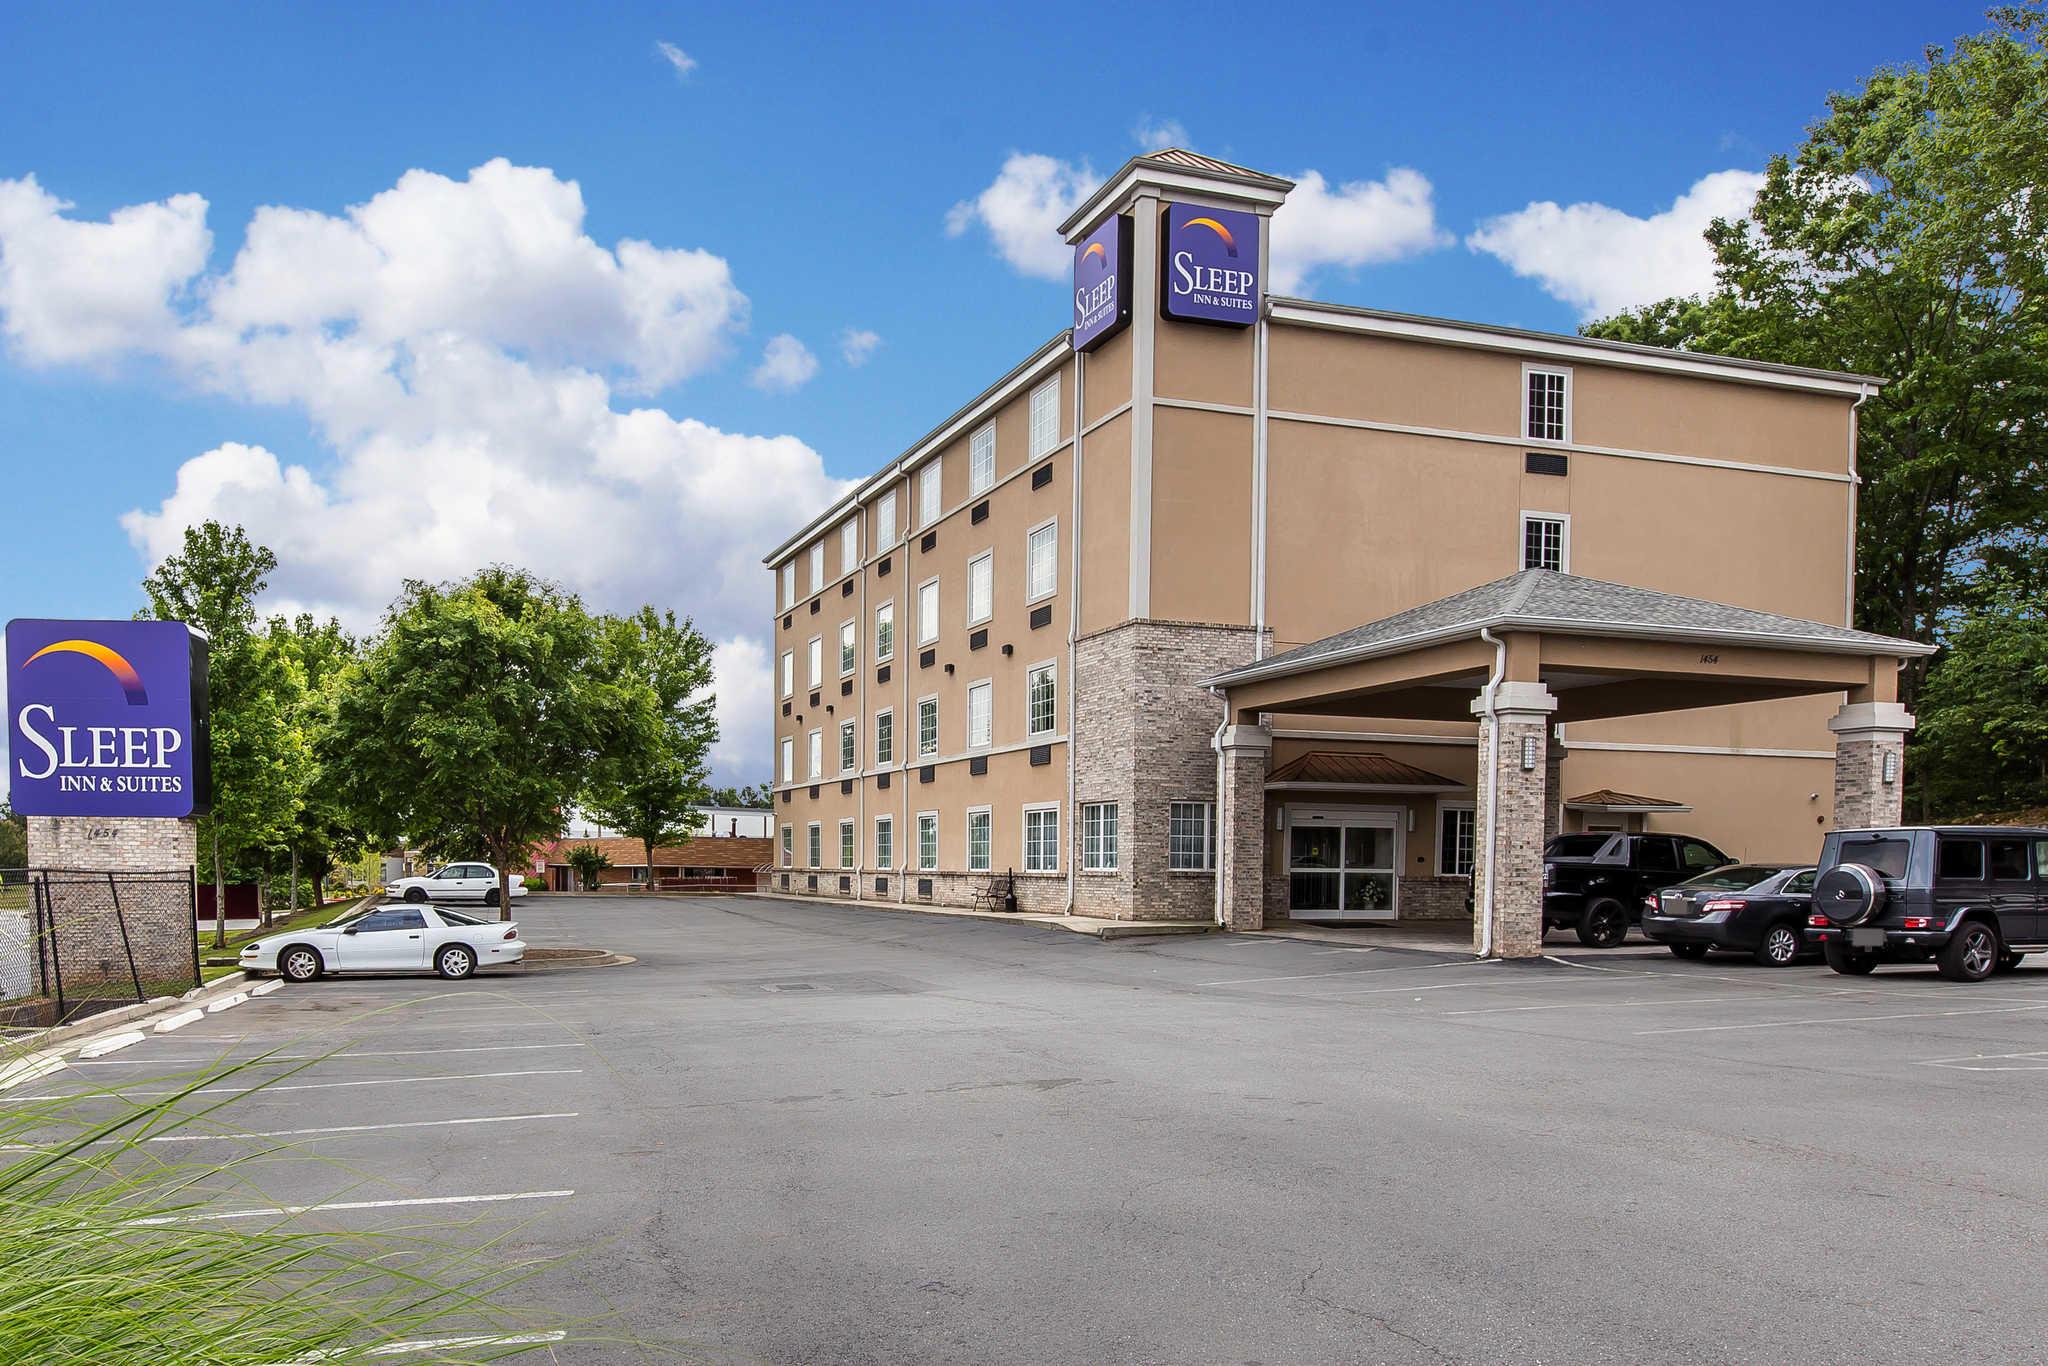 Sleep Inn & Suites At Kennesaw State University image 1